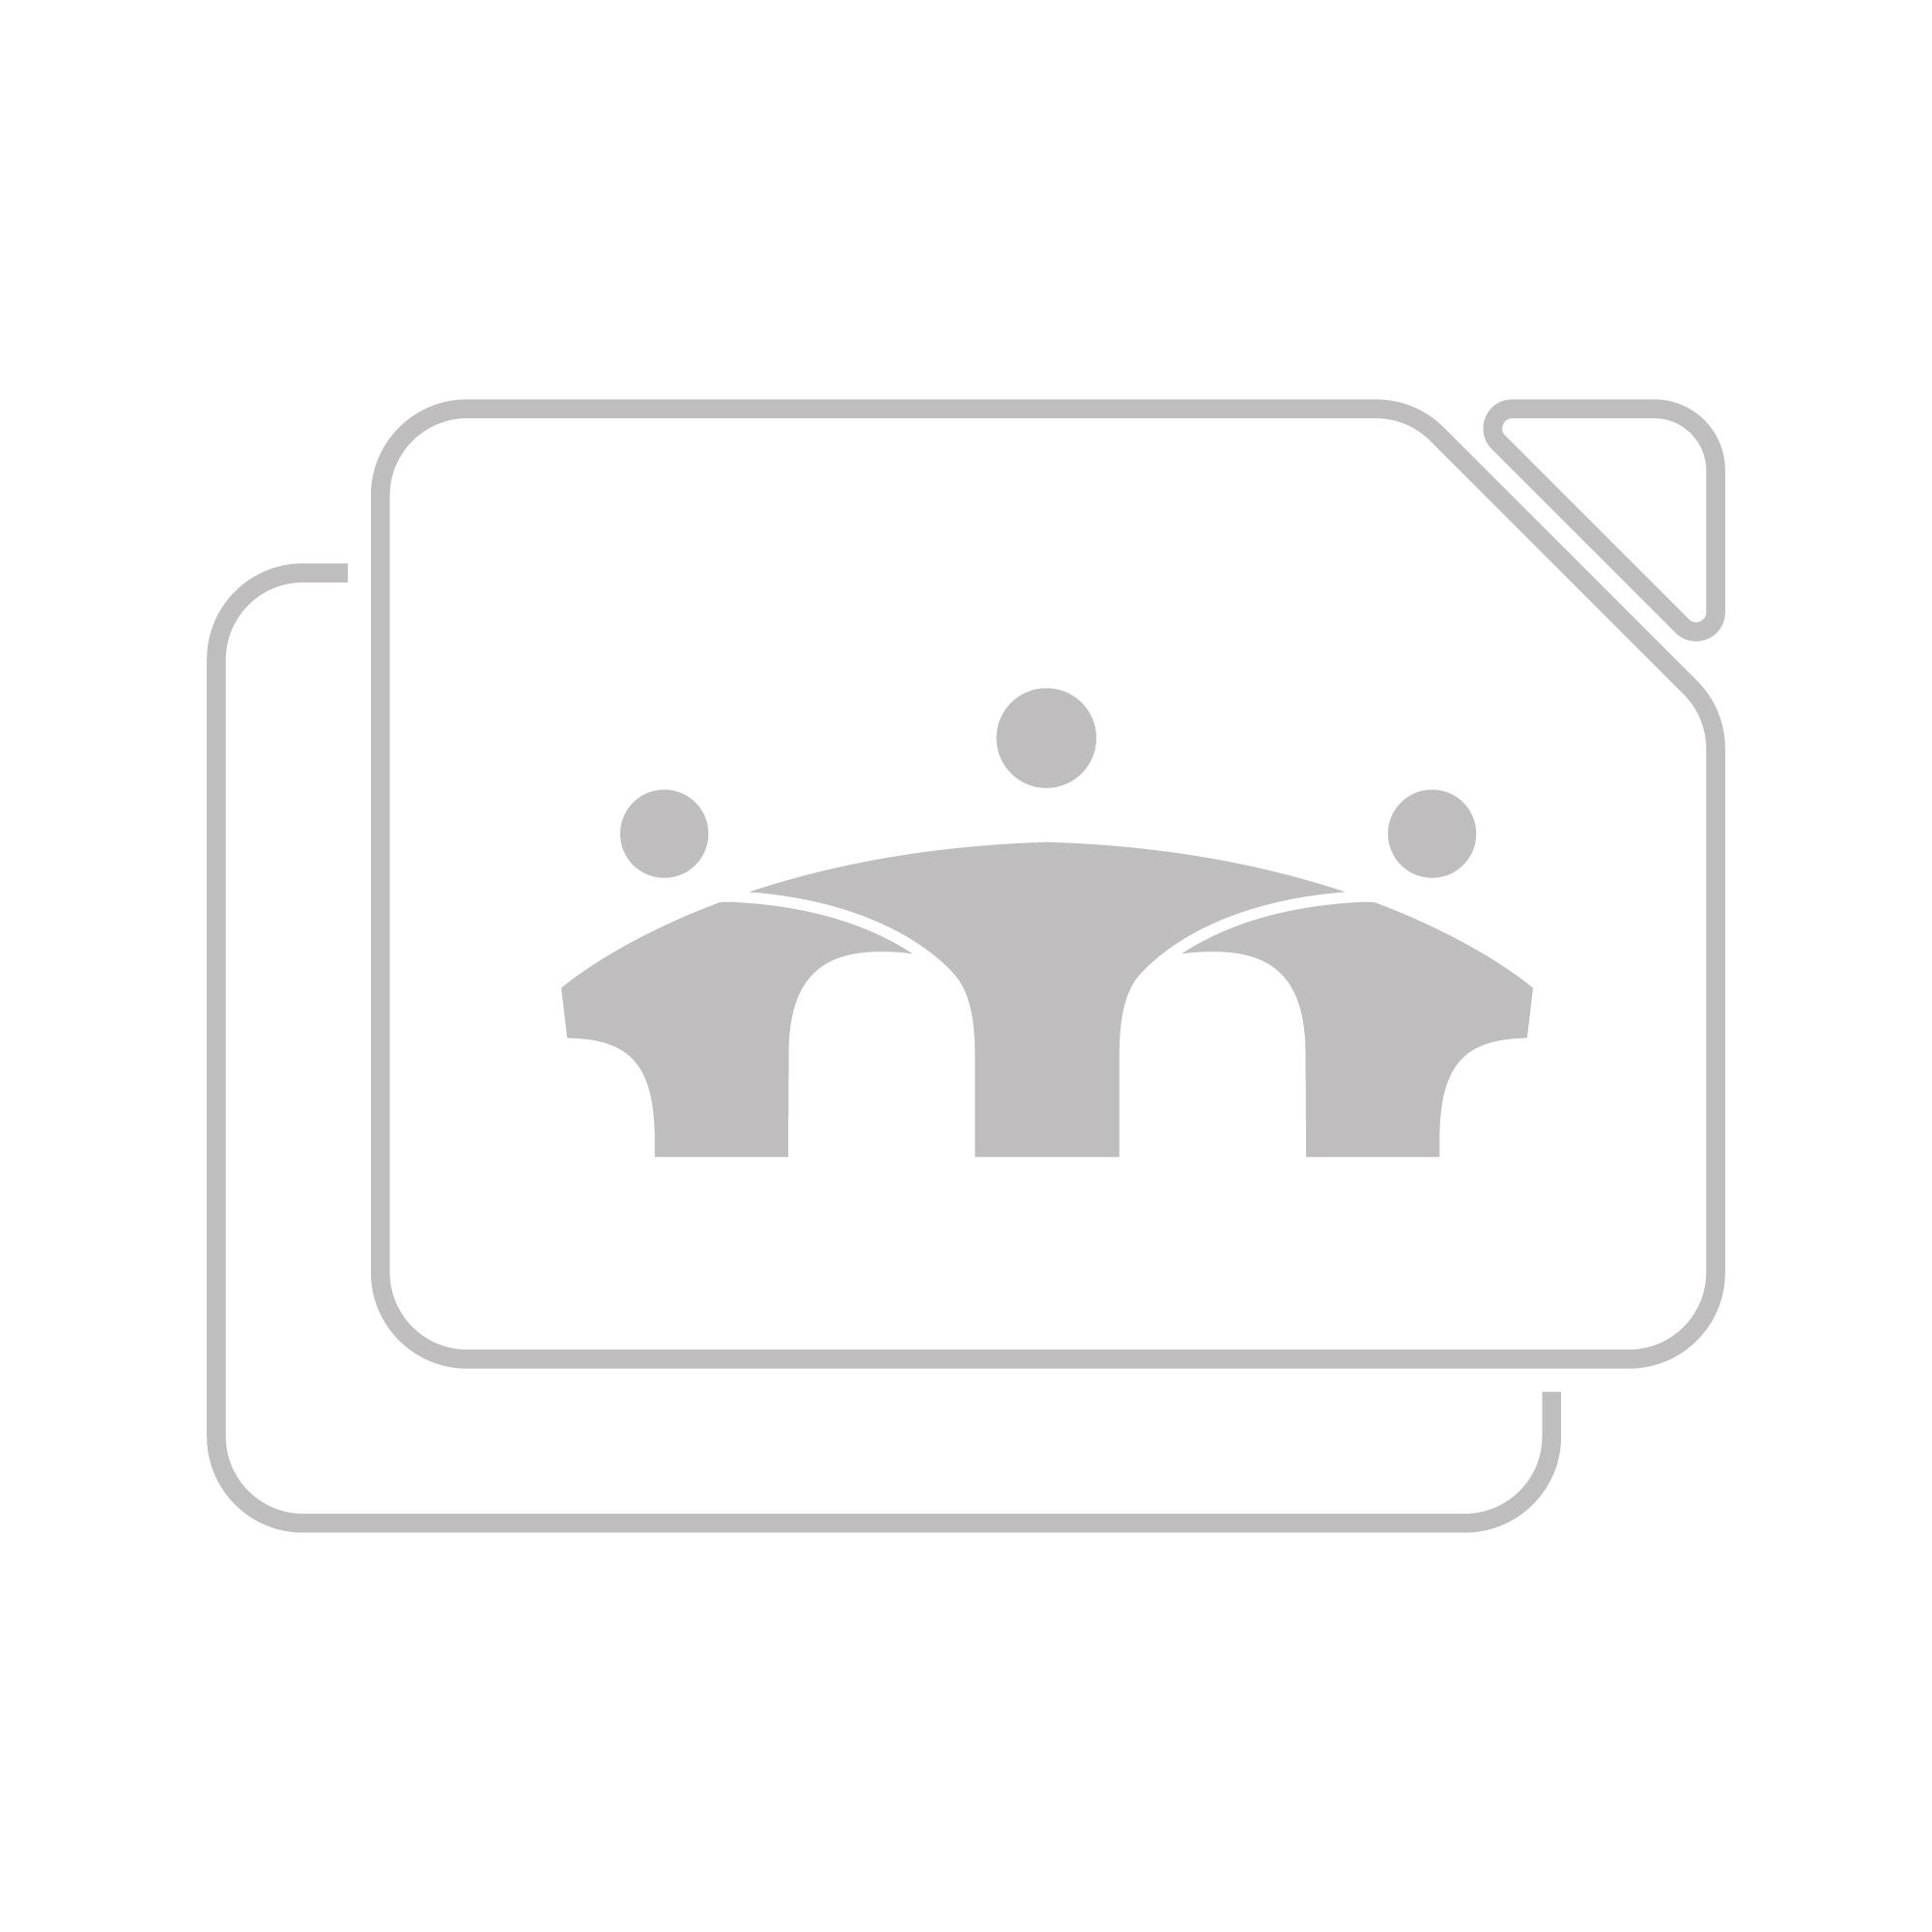 Western Digital Ultrastar DC SN840 1.92TB NVMe 1DW/D SE